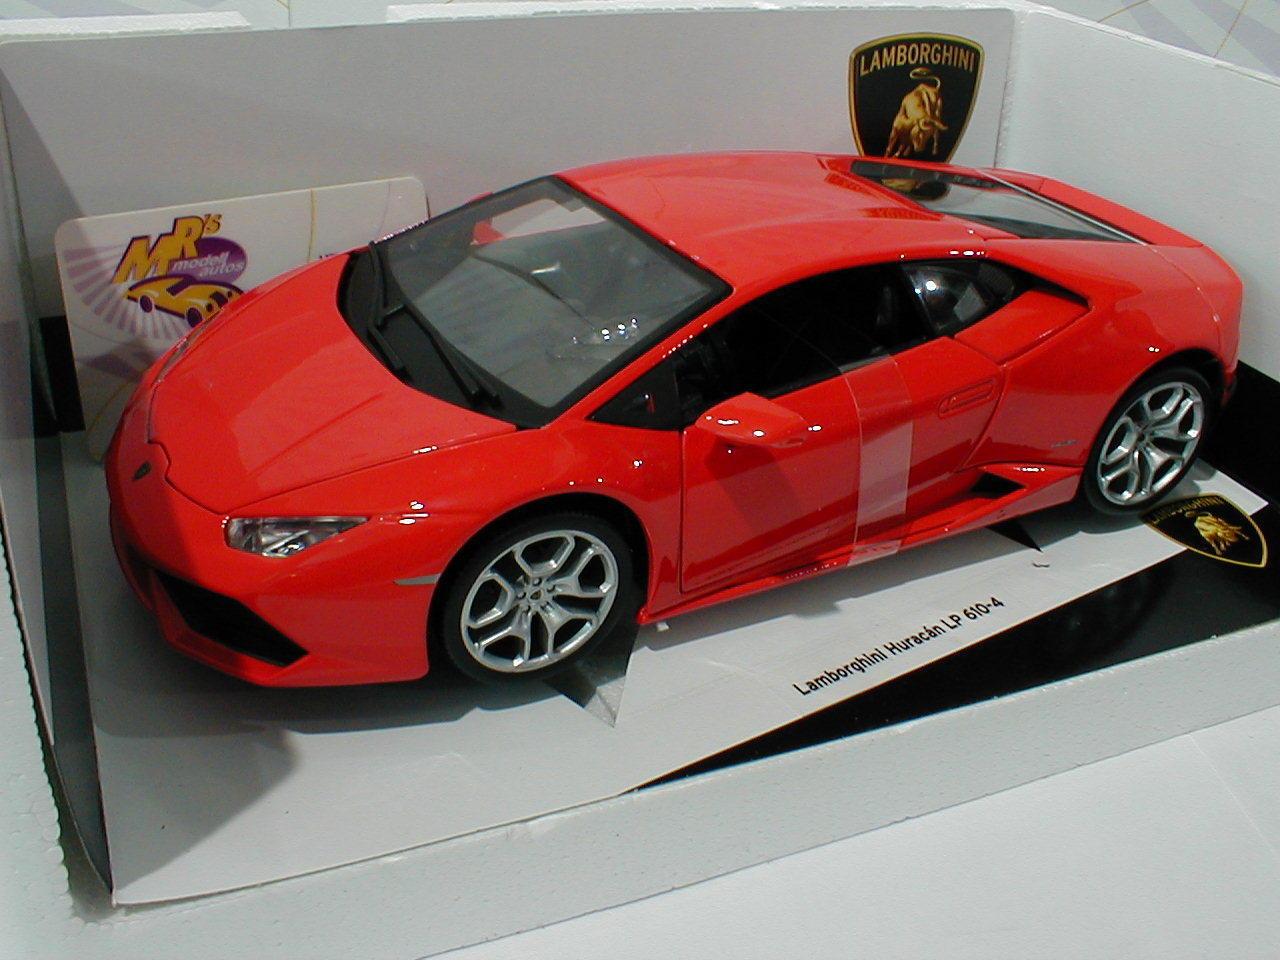 Bburago 18-11038R   Lamborghini Hurcan LP 610-4 610-4 610-4 Baujahr 2014 in   rot   1 18 NEU  | Einzigartig  ea2f87